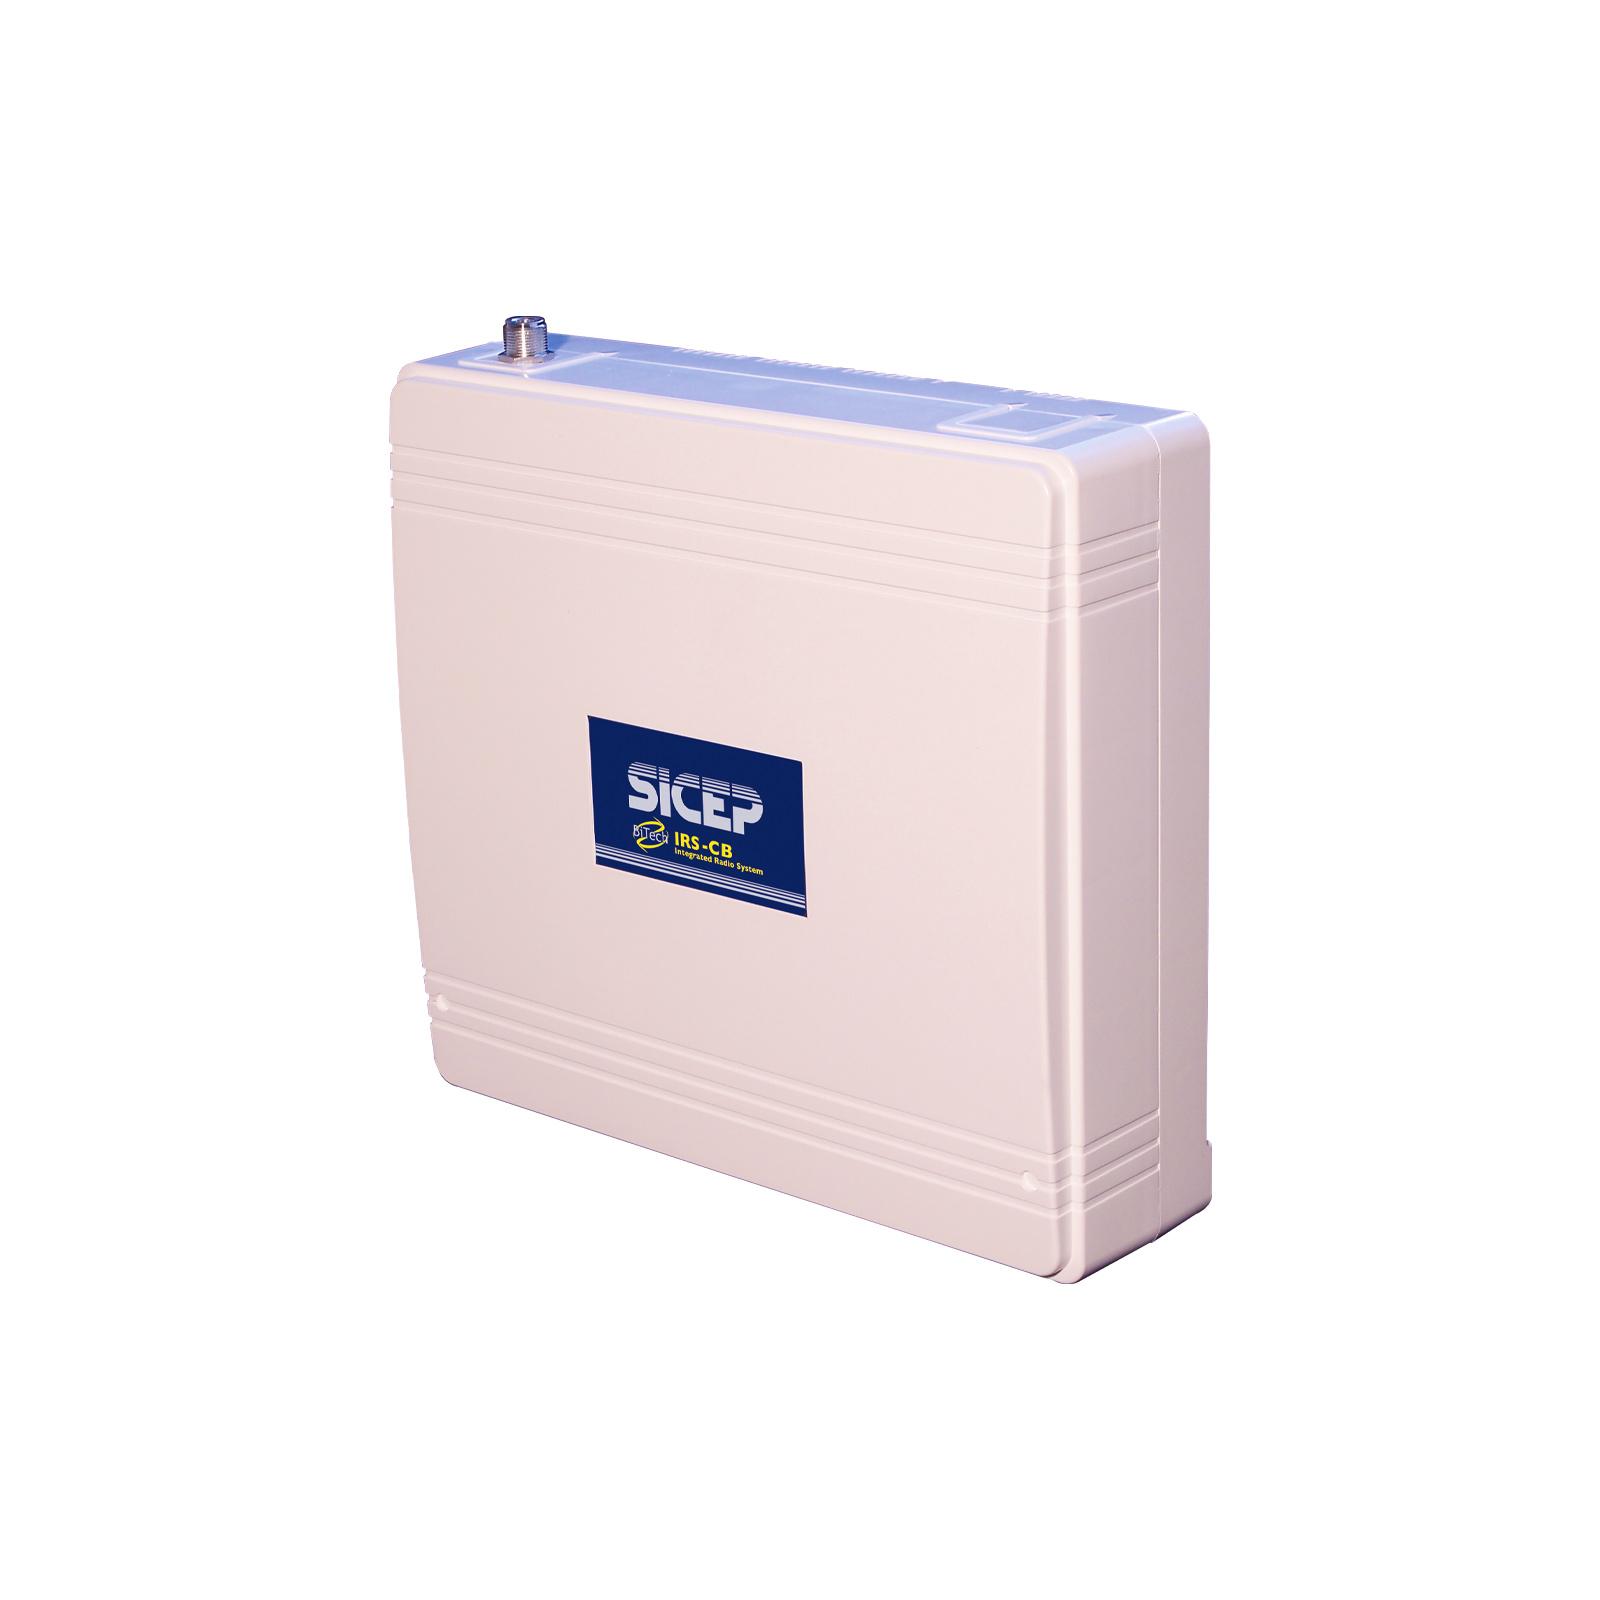 Vhf Uhf alarm control panels